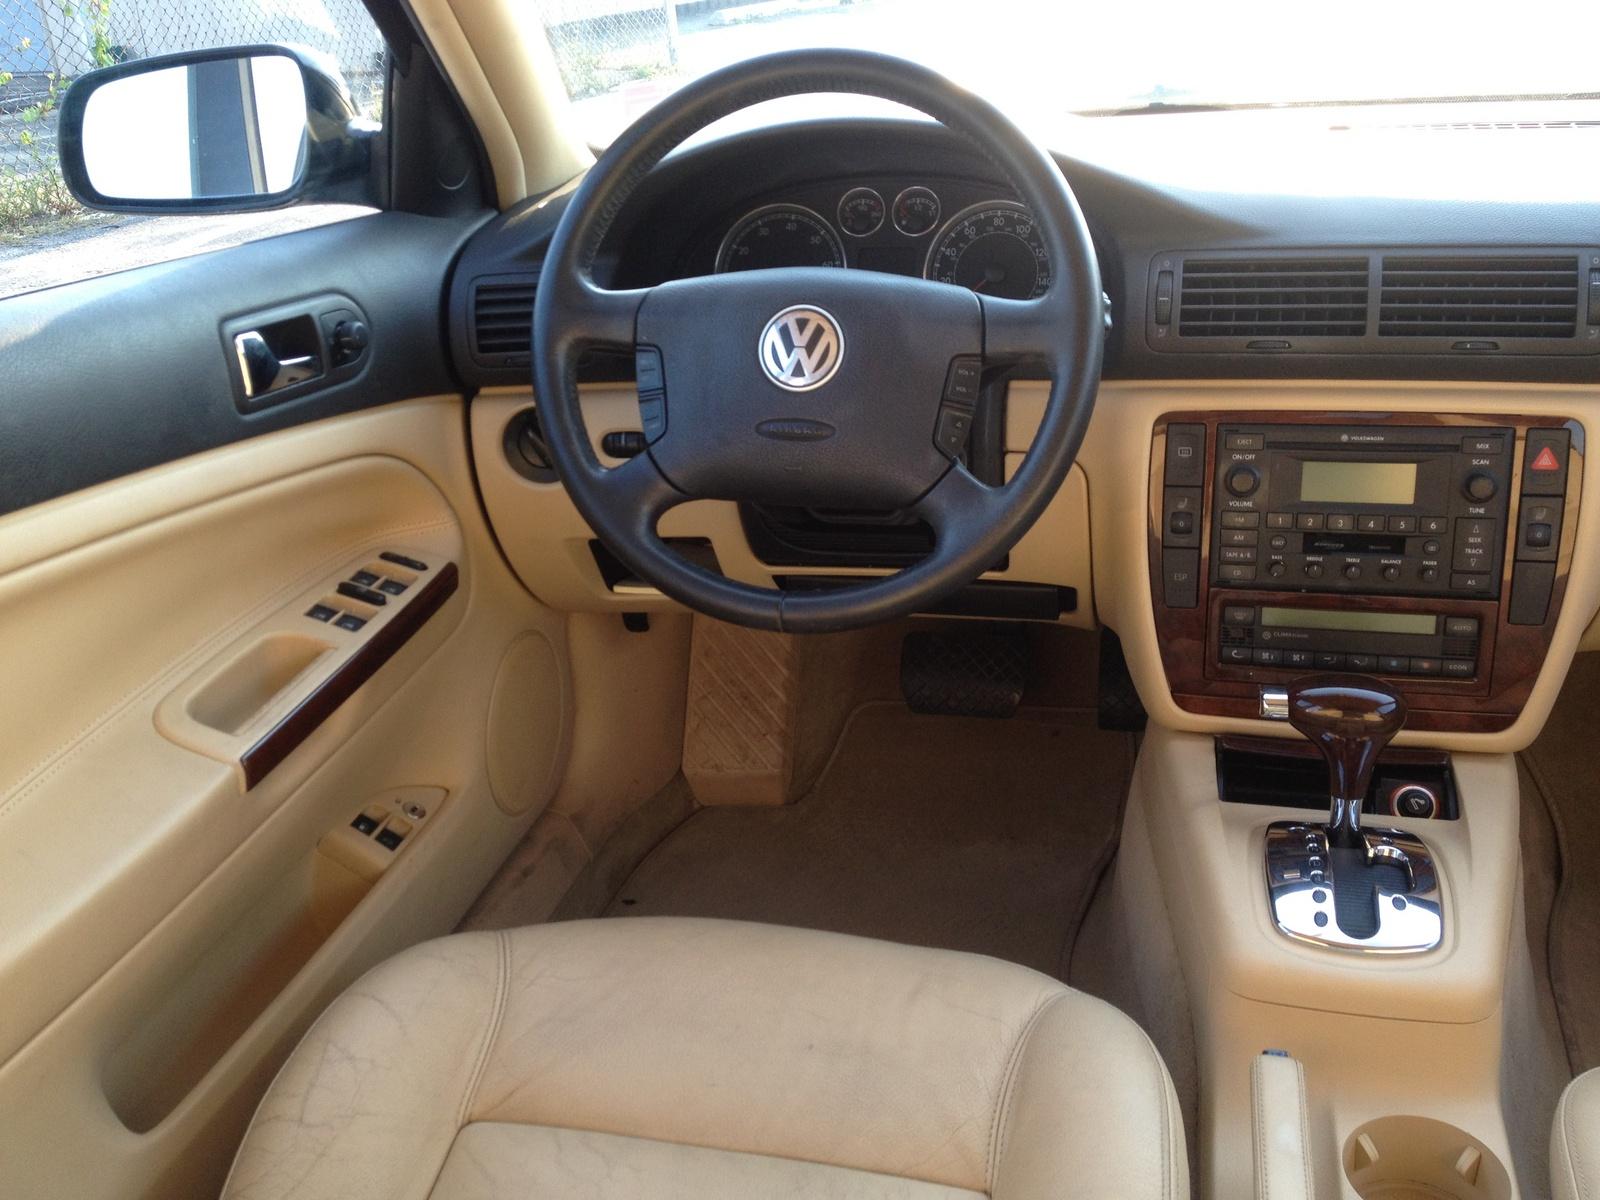 2004 volkswagen passat interior pictures cargurus for Volkswagen passat 2000 interior